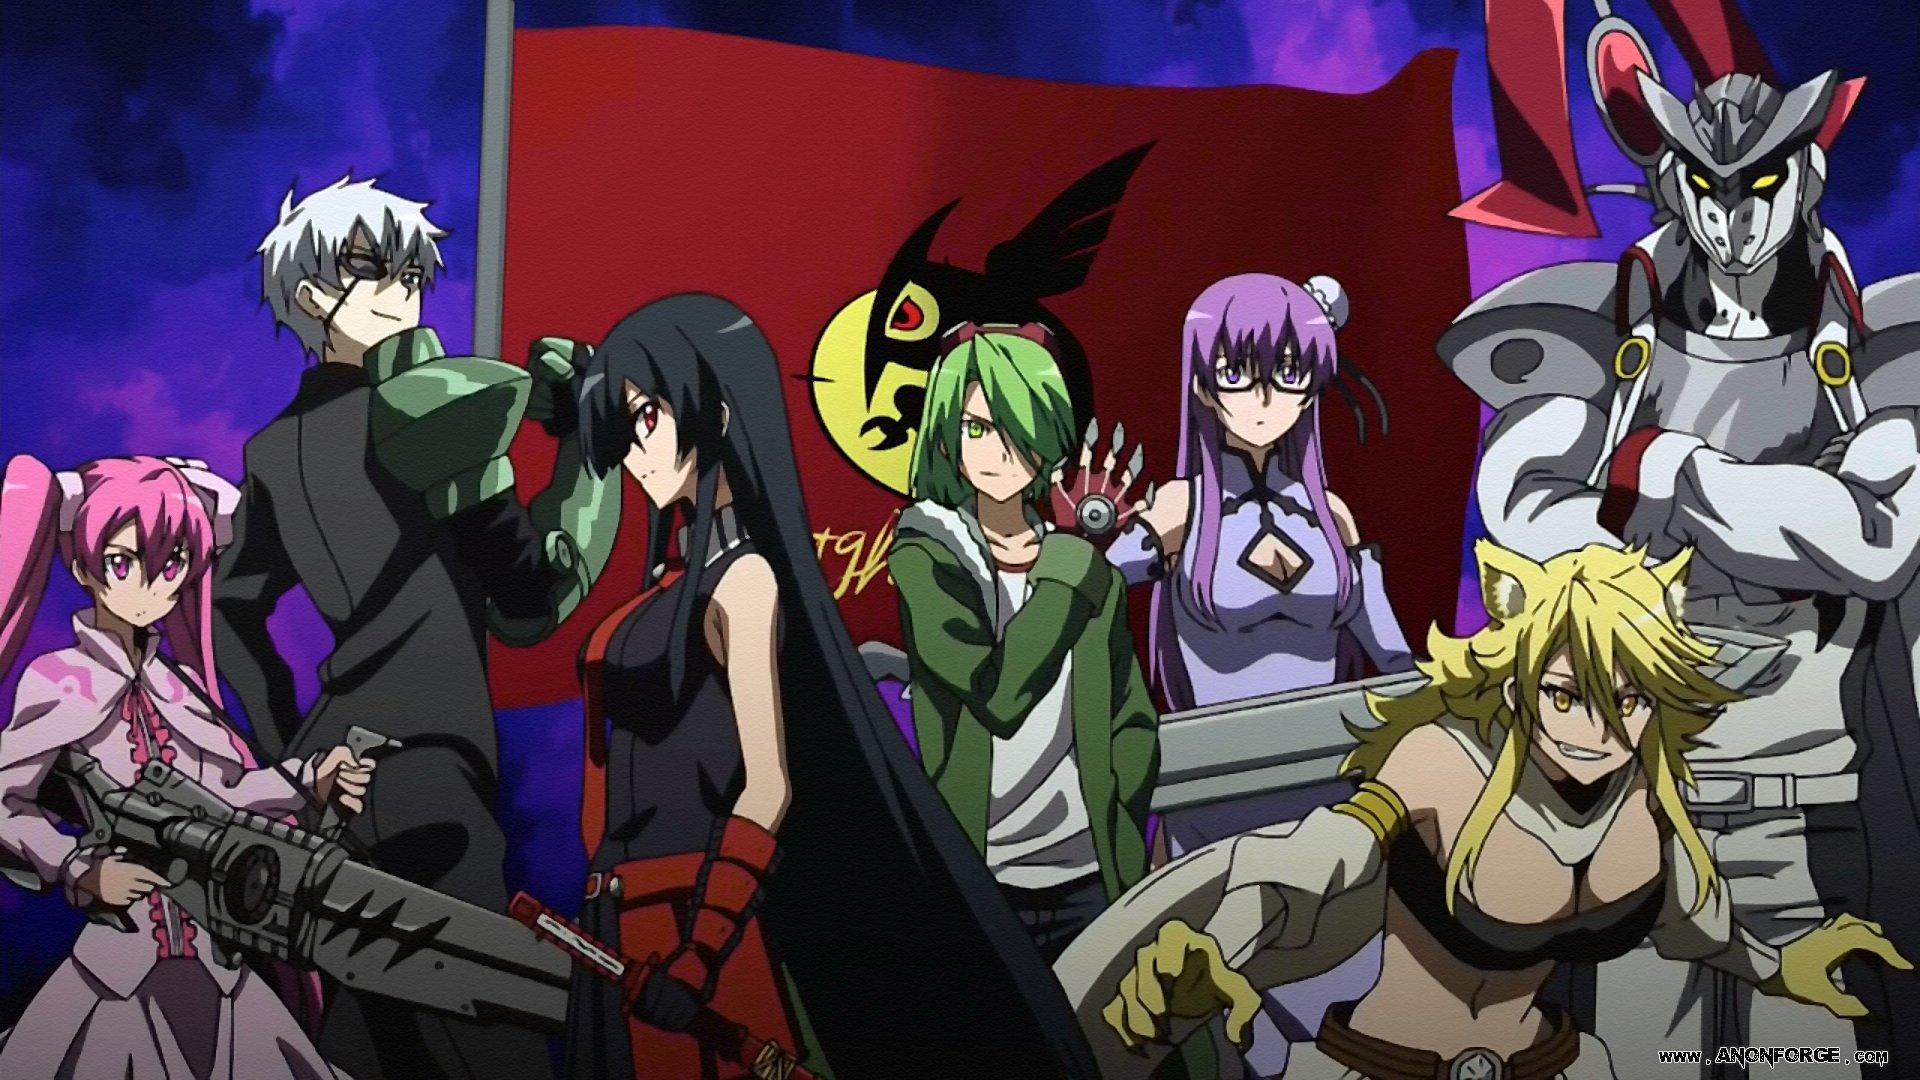 Akame ga Kill in animes similar to hunter x hunter